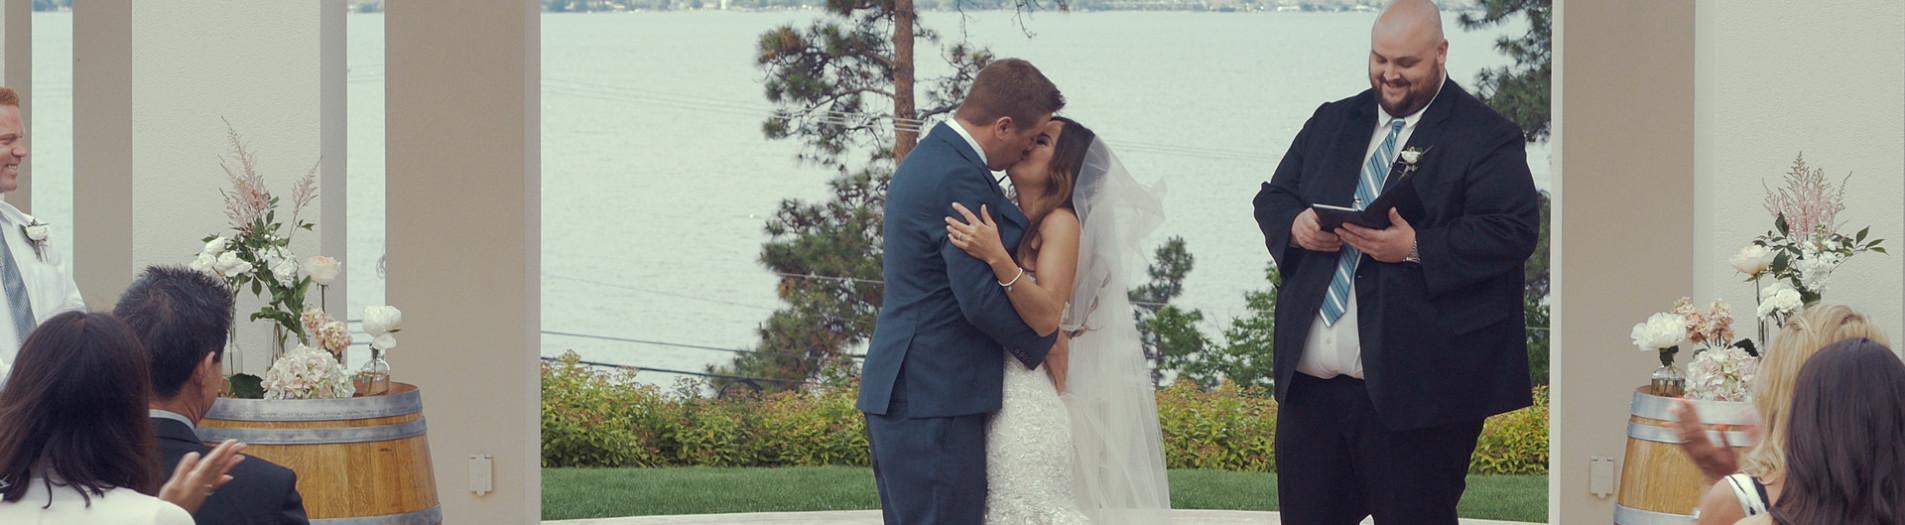 Blaine & Wyn // Wedding Film BC // Cedar Creek Winery, Kelowna, BC